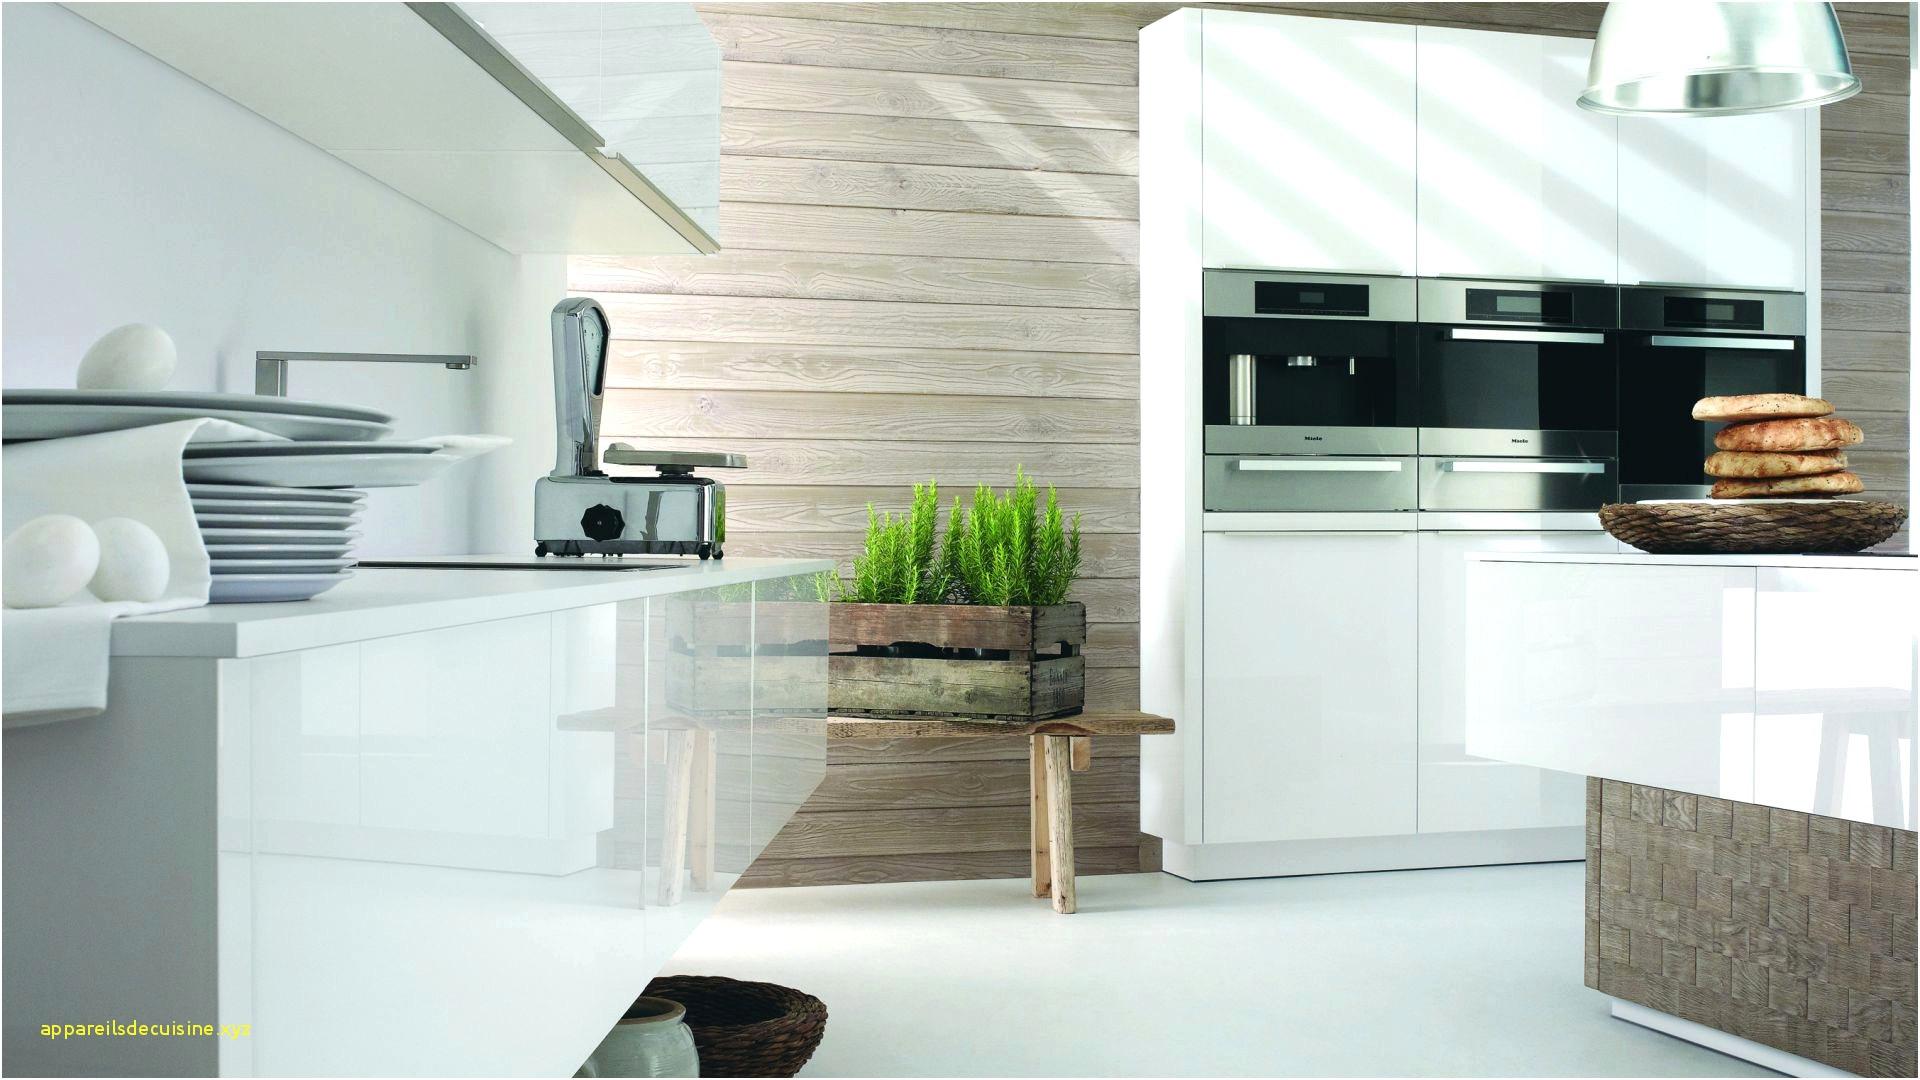 salon de jardin le bon coin lyon jardin piscine et cabane. Black Bedroom Furniture Sets. Home Design Ideas